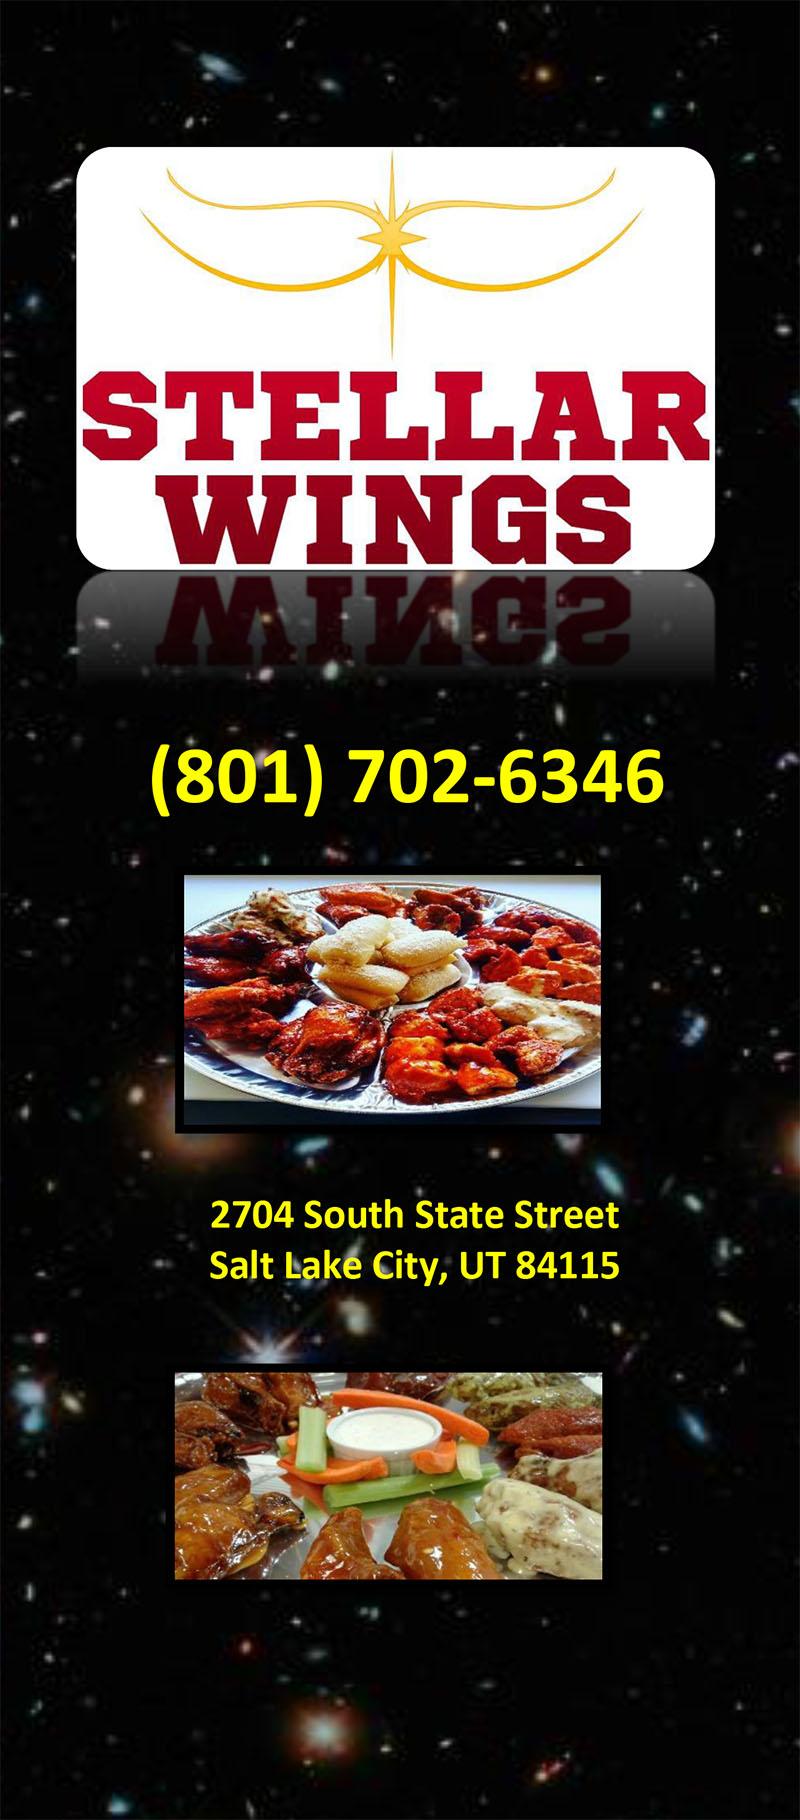 Stellar Wings menu - menu cover